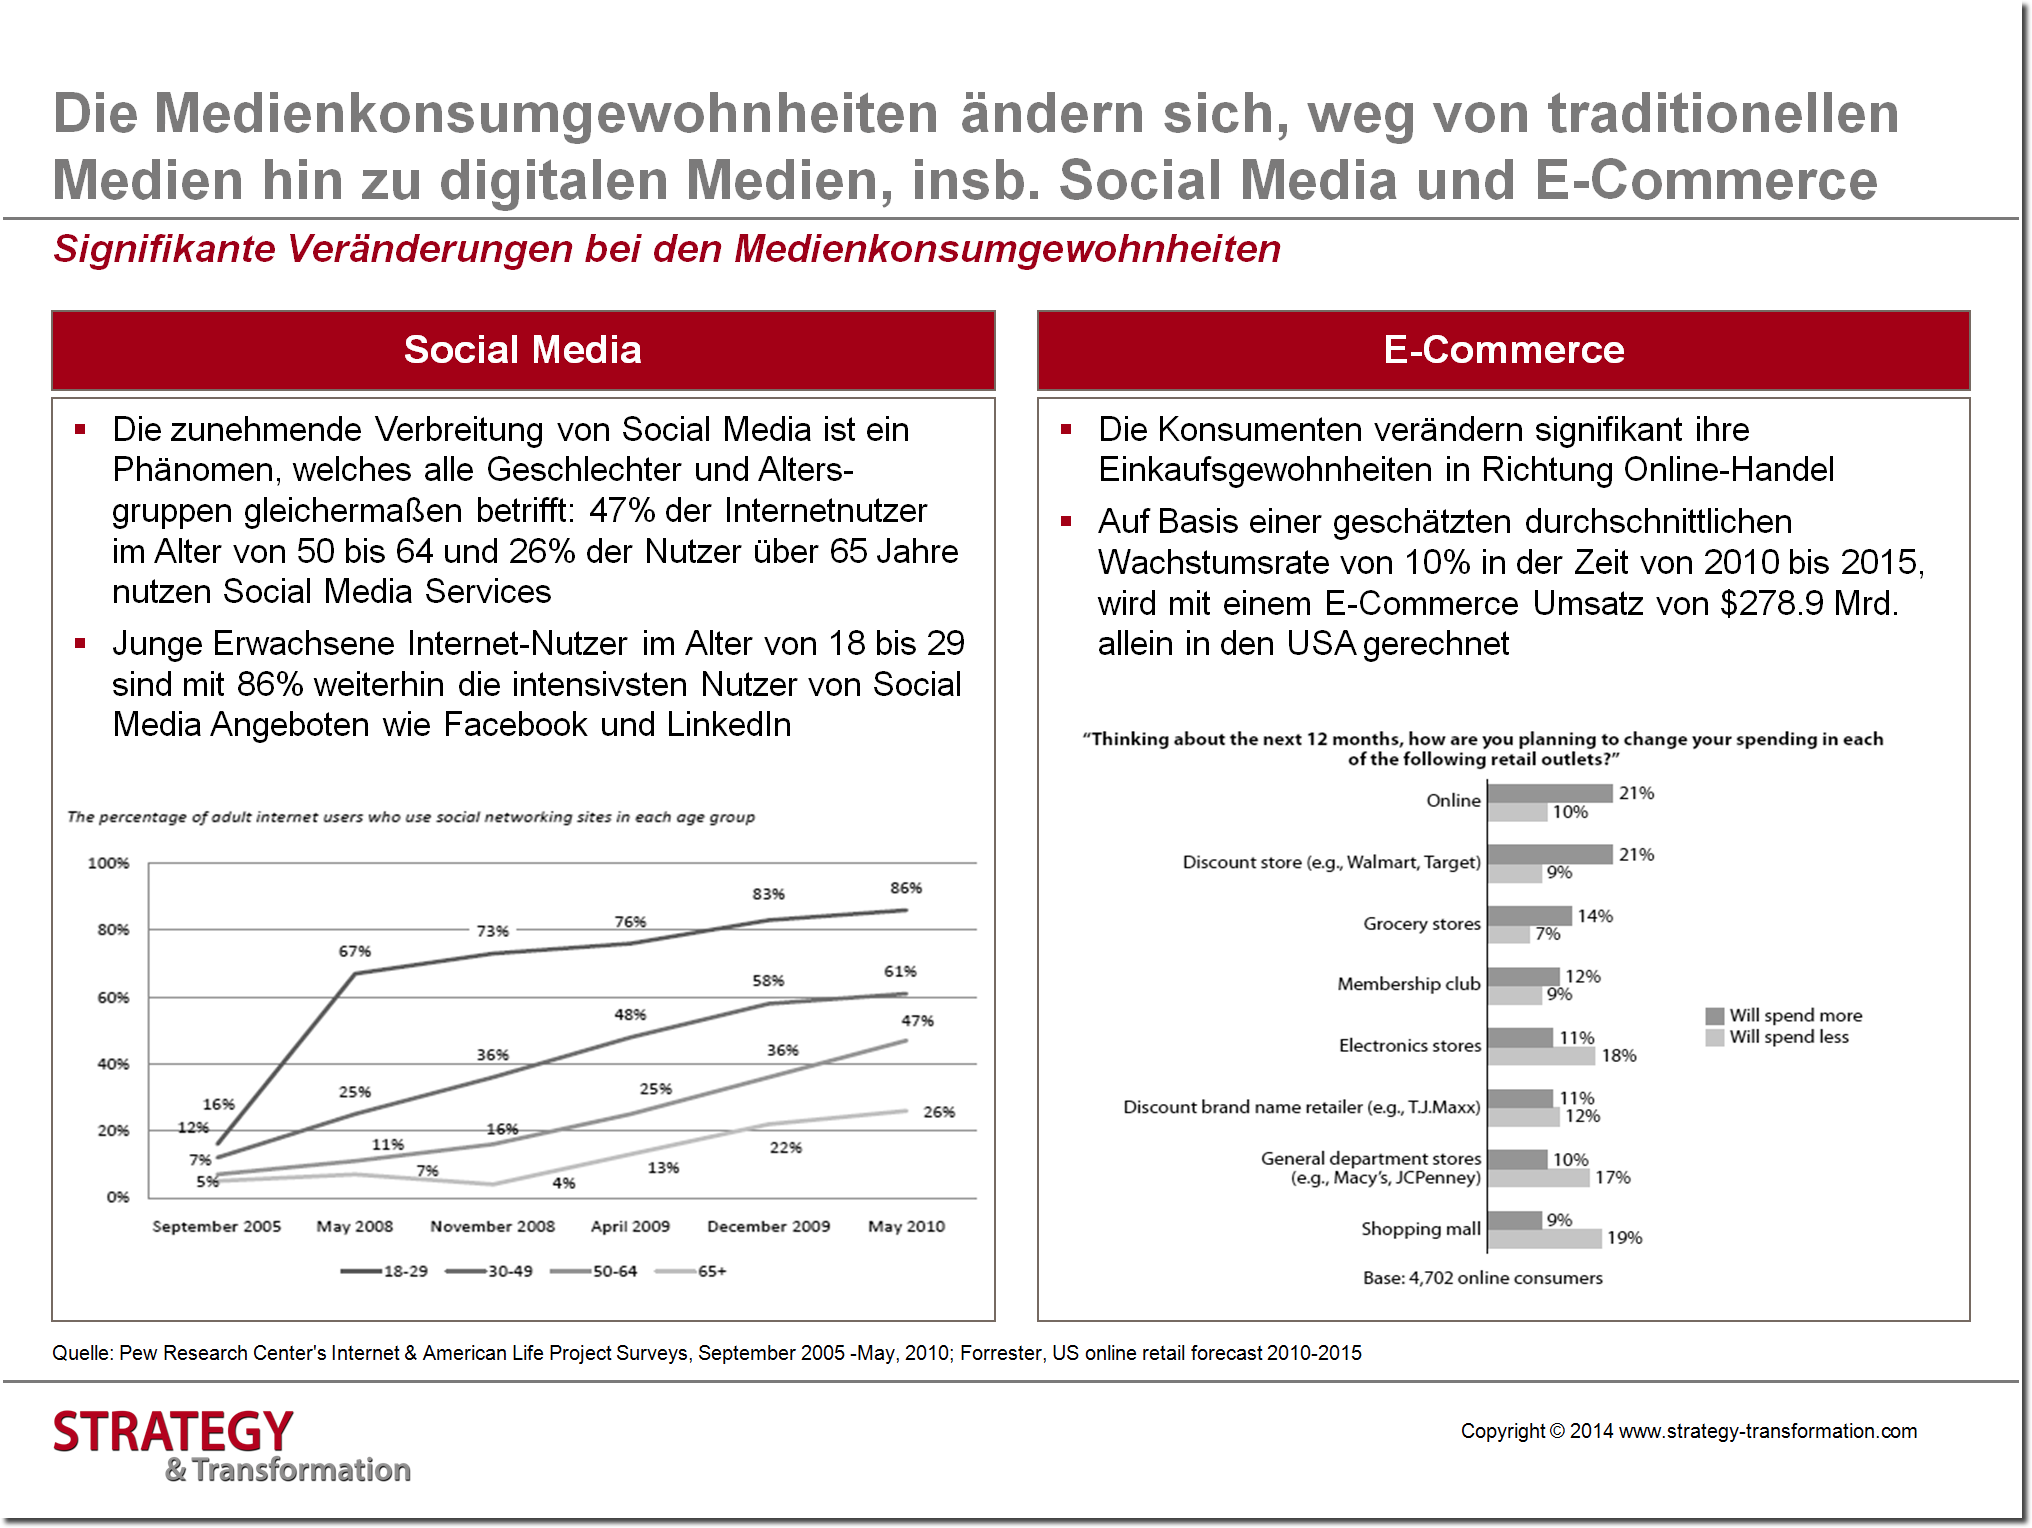 Social Media verstehen_Veränderungen Medienkonsumgewohnheiten